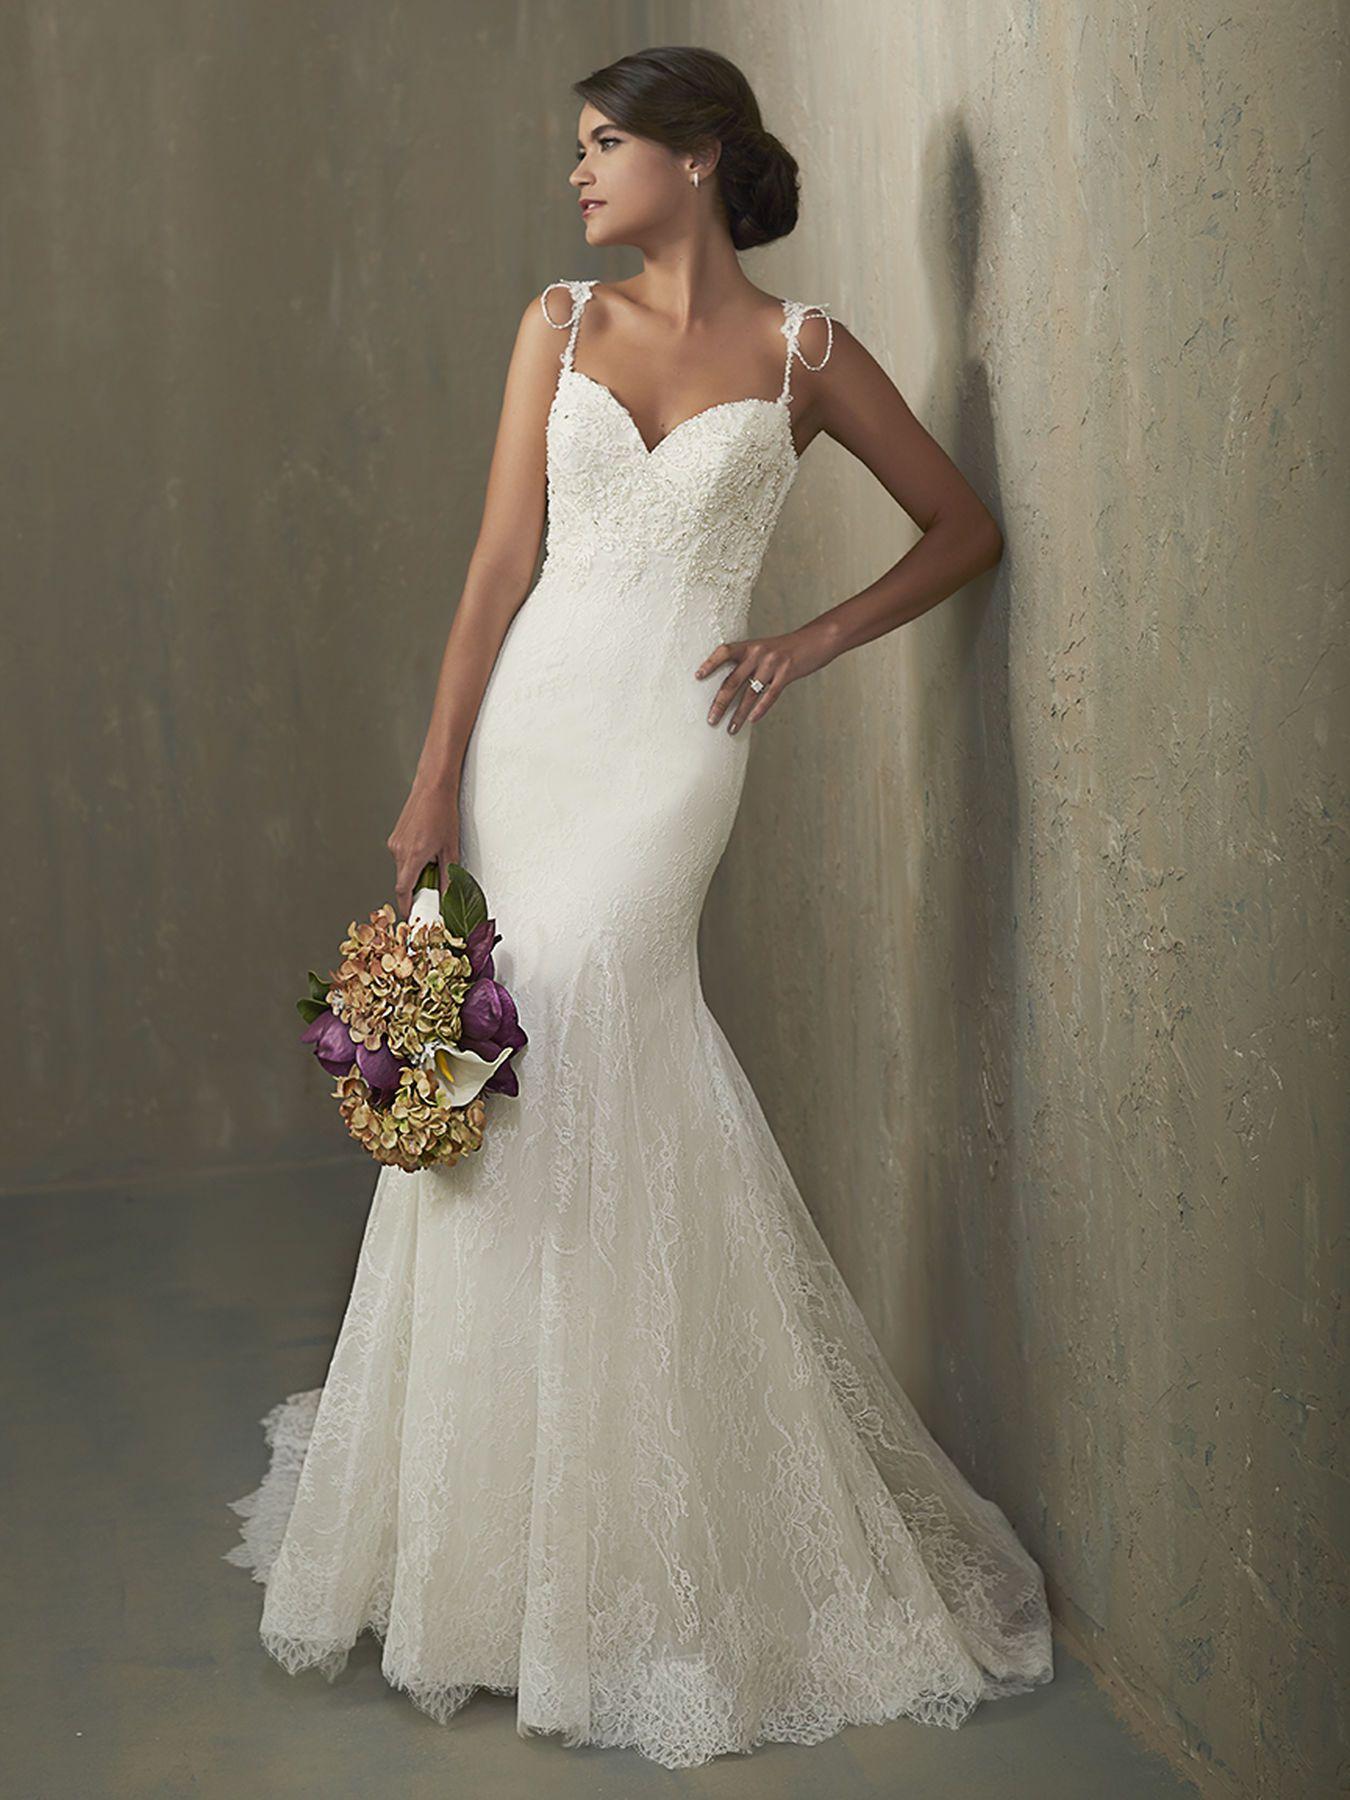 Lace strap wedding dress  Ivy  Wedding Spotlights  Pinterest  Adrianna papell Lace